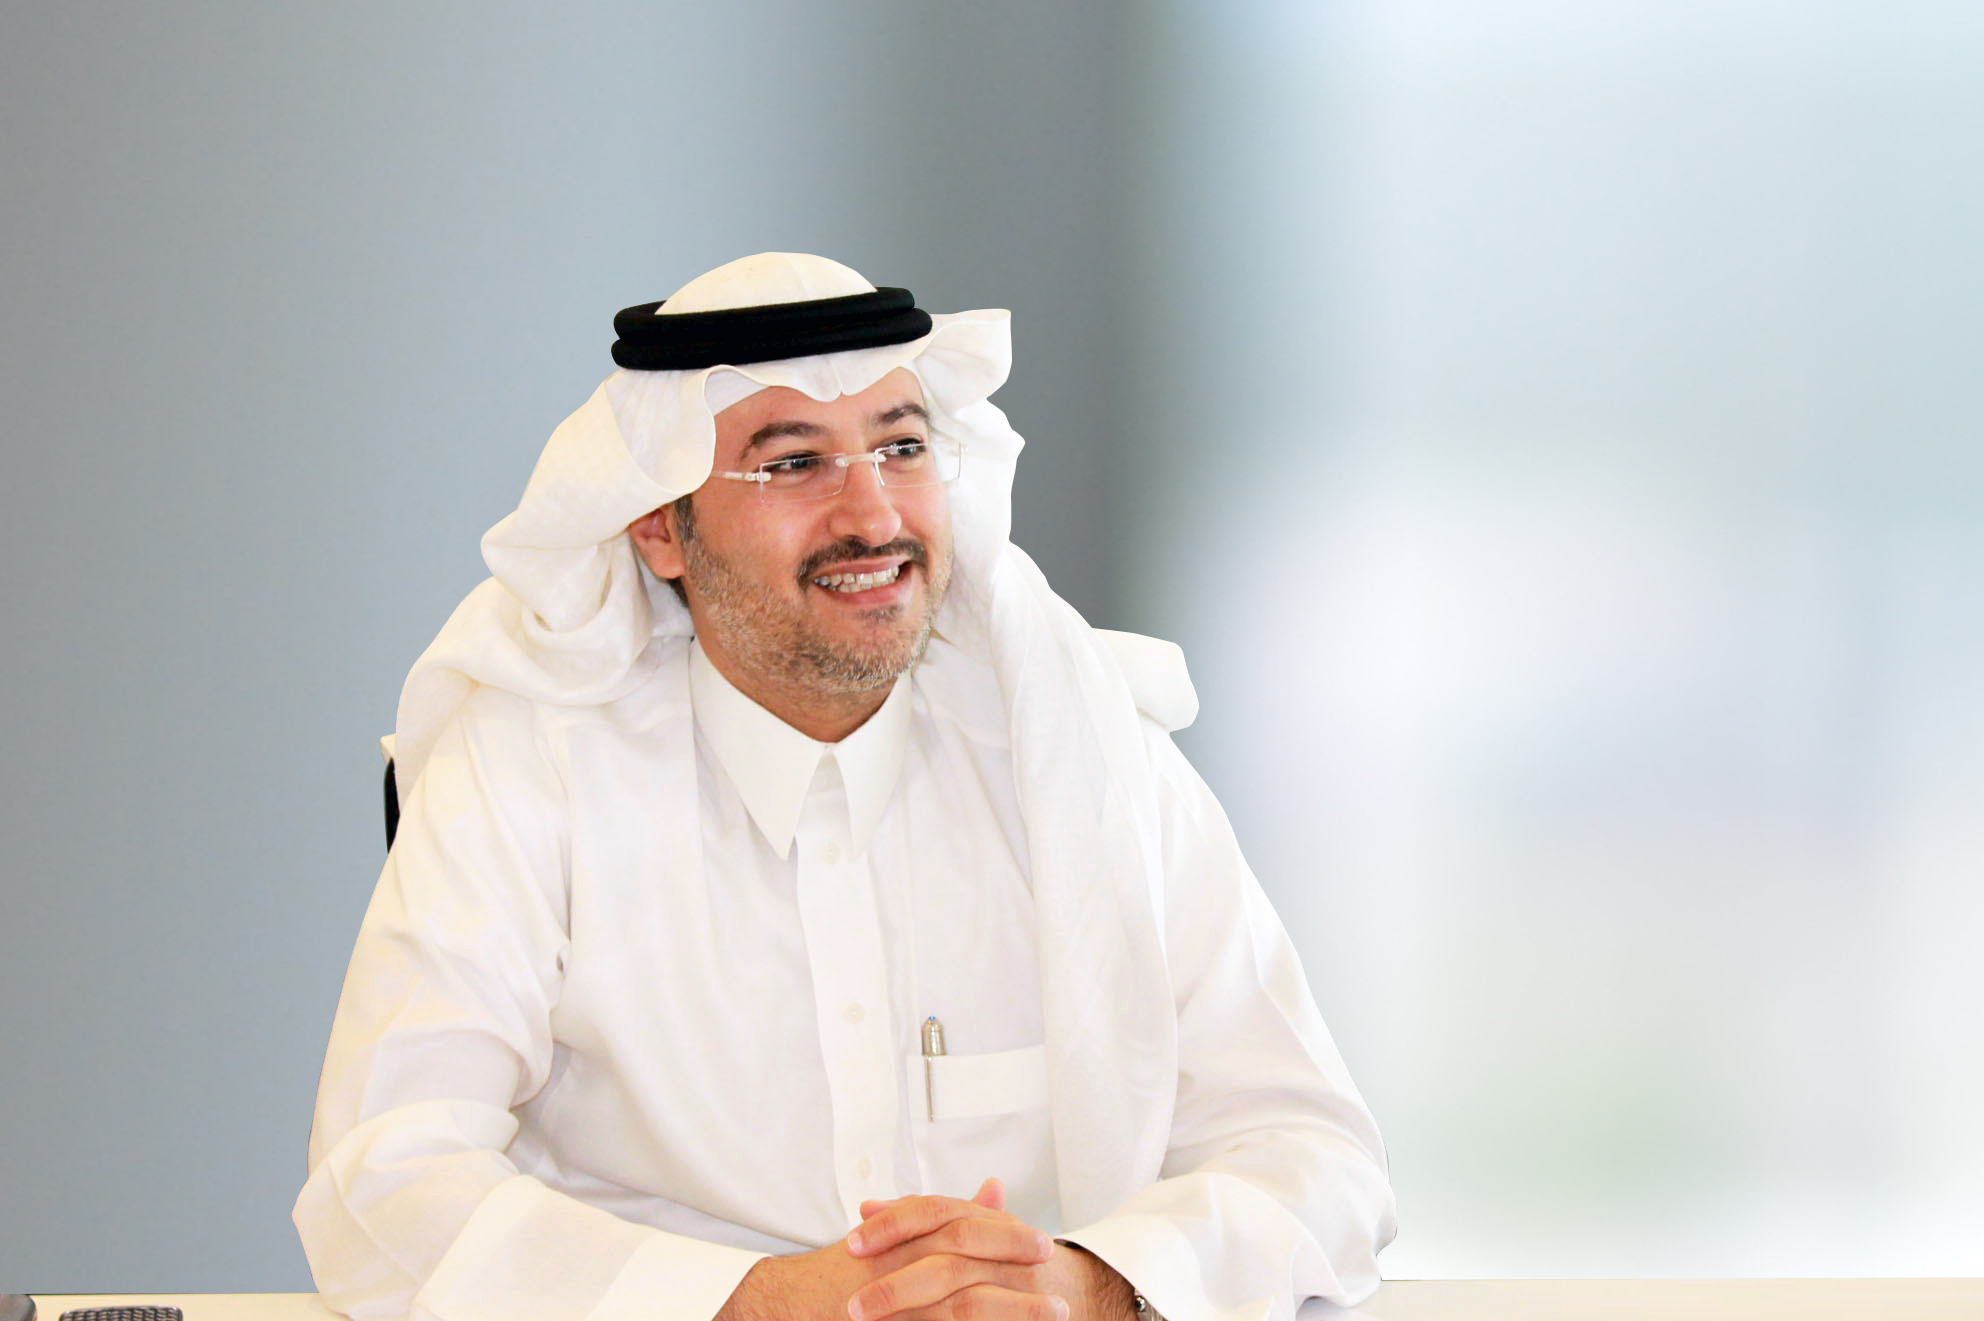 Nayifat CEO - Abdulmohsen AlSowailem